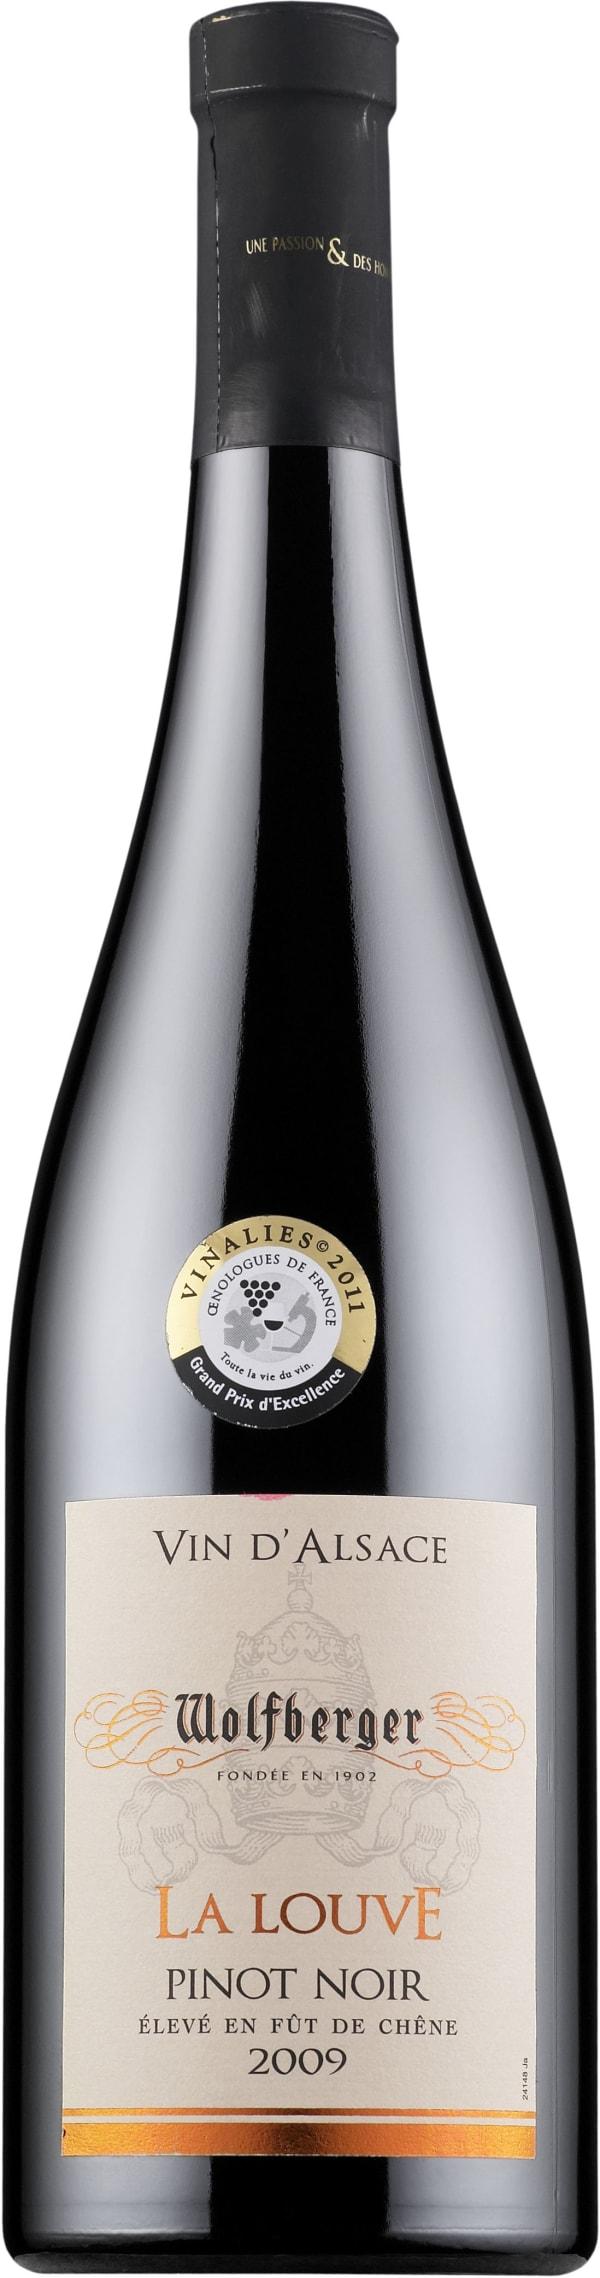 Wolfberger La Louve Pinot Noir 2015